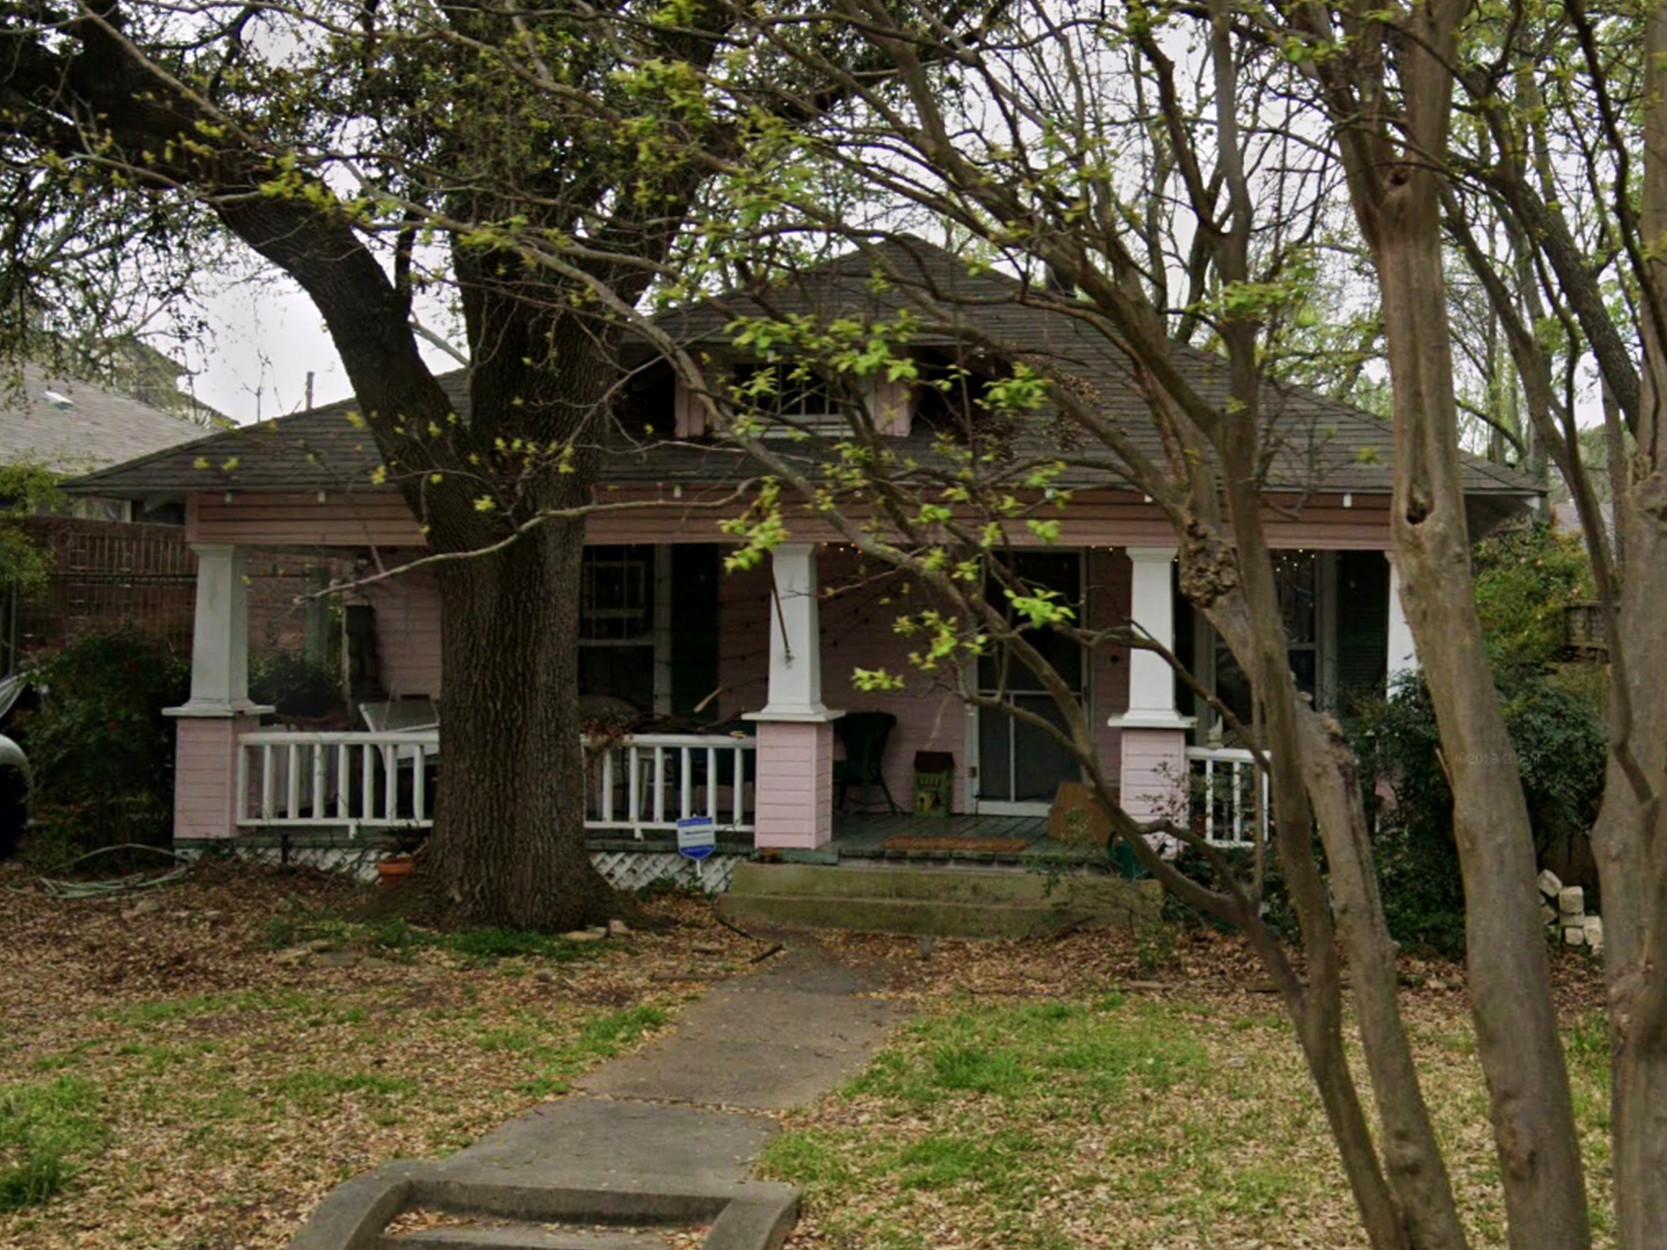 Texas demolition crew destroys wrong home in historic Dallas neighborhood